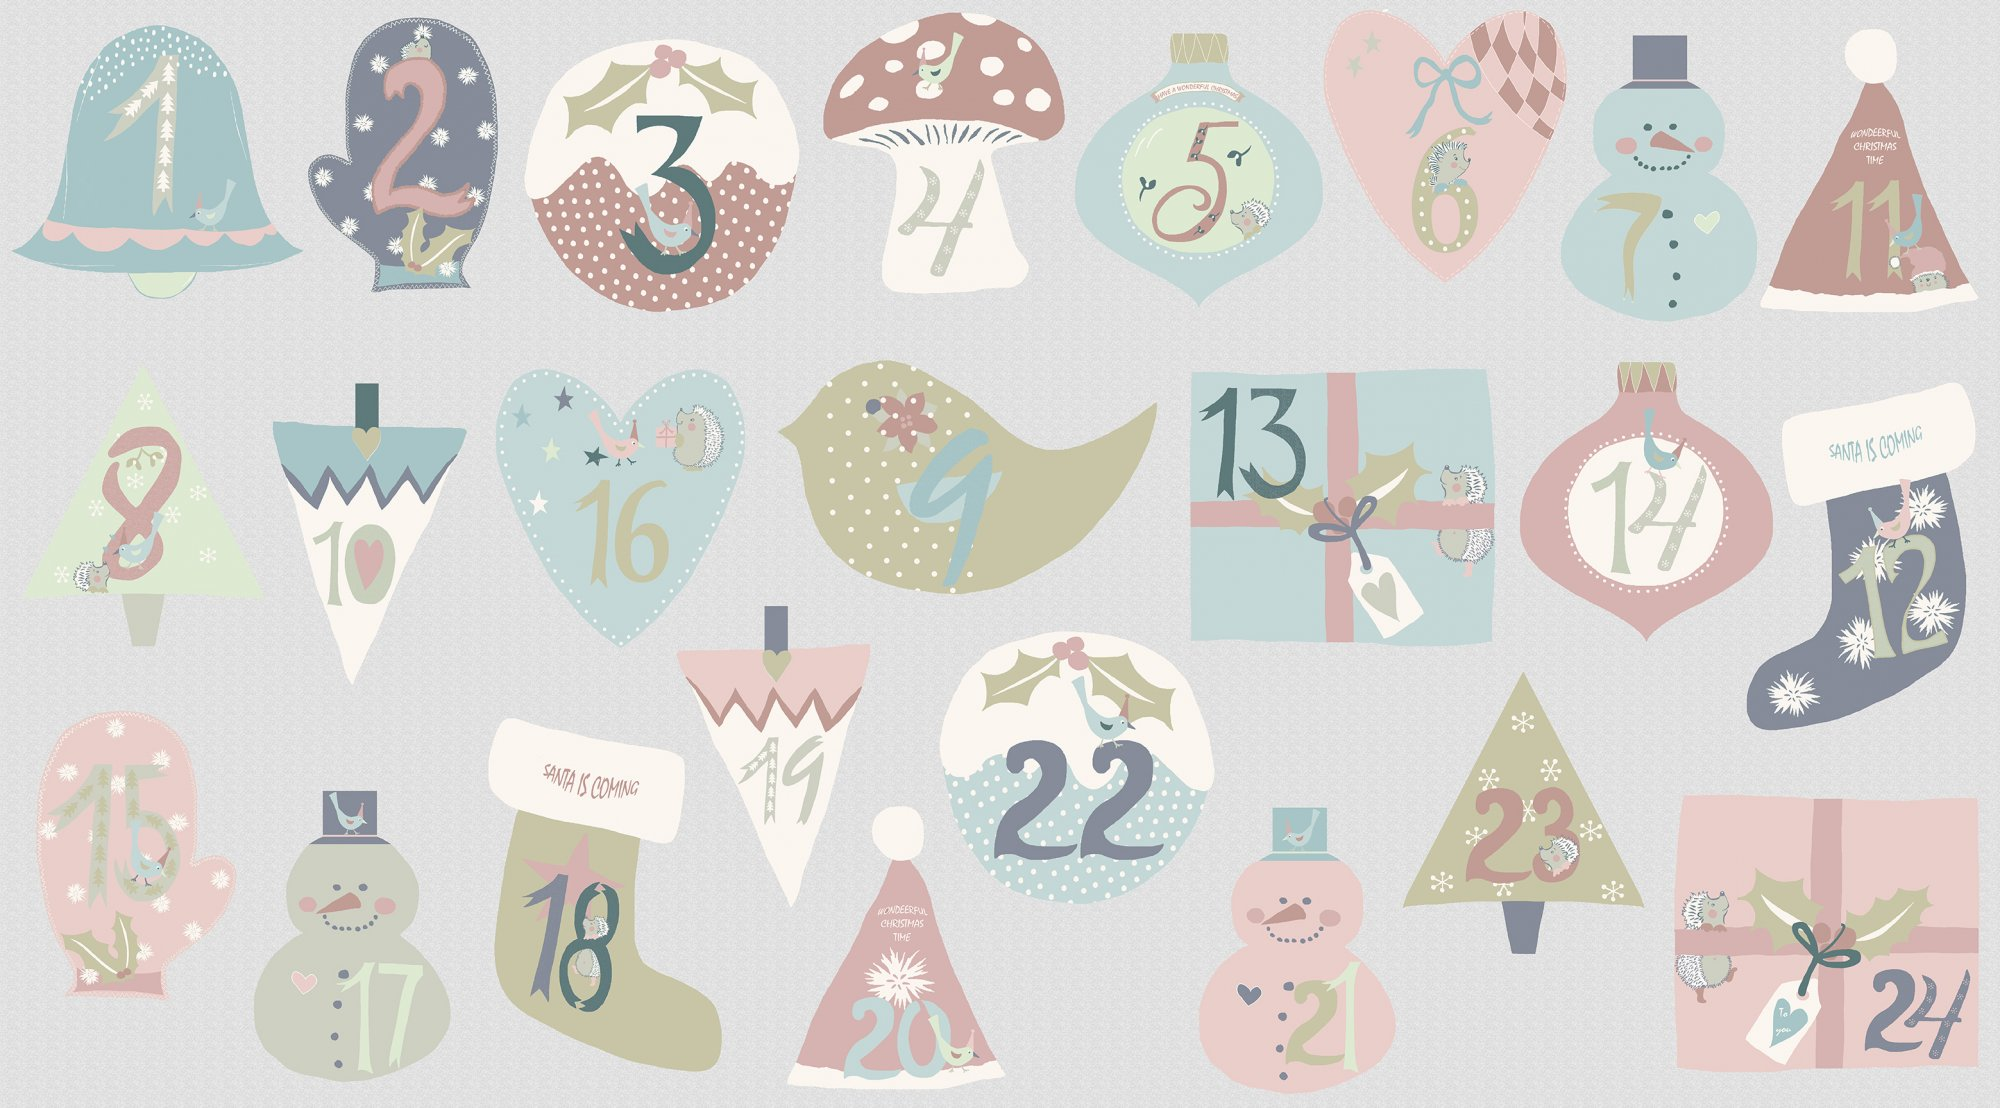 You Make Me Happy Christmas Advent Calendar Panel 24 by Stof